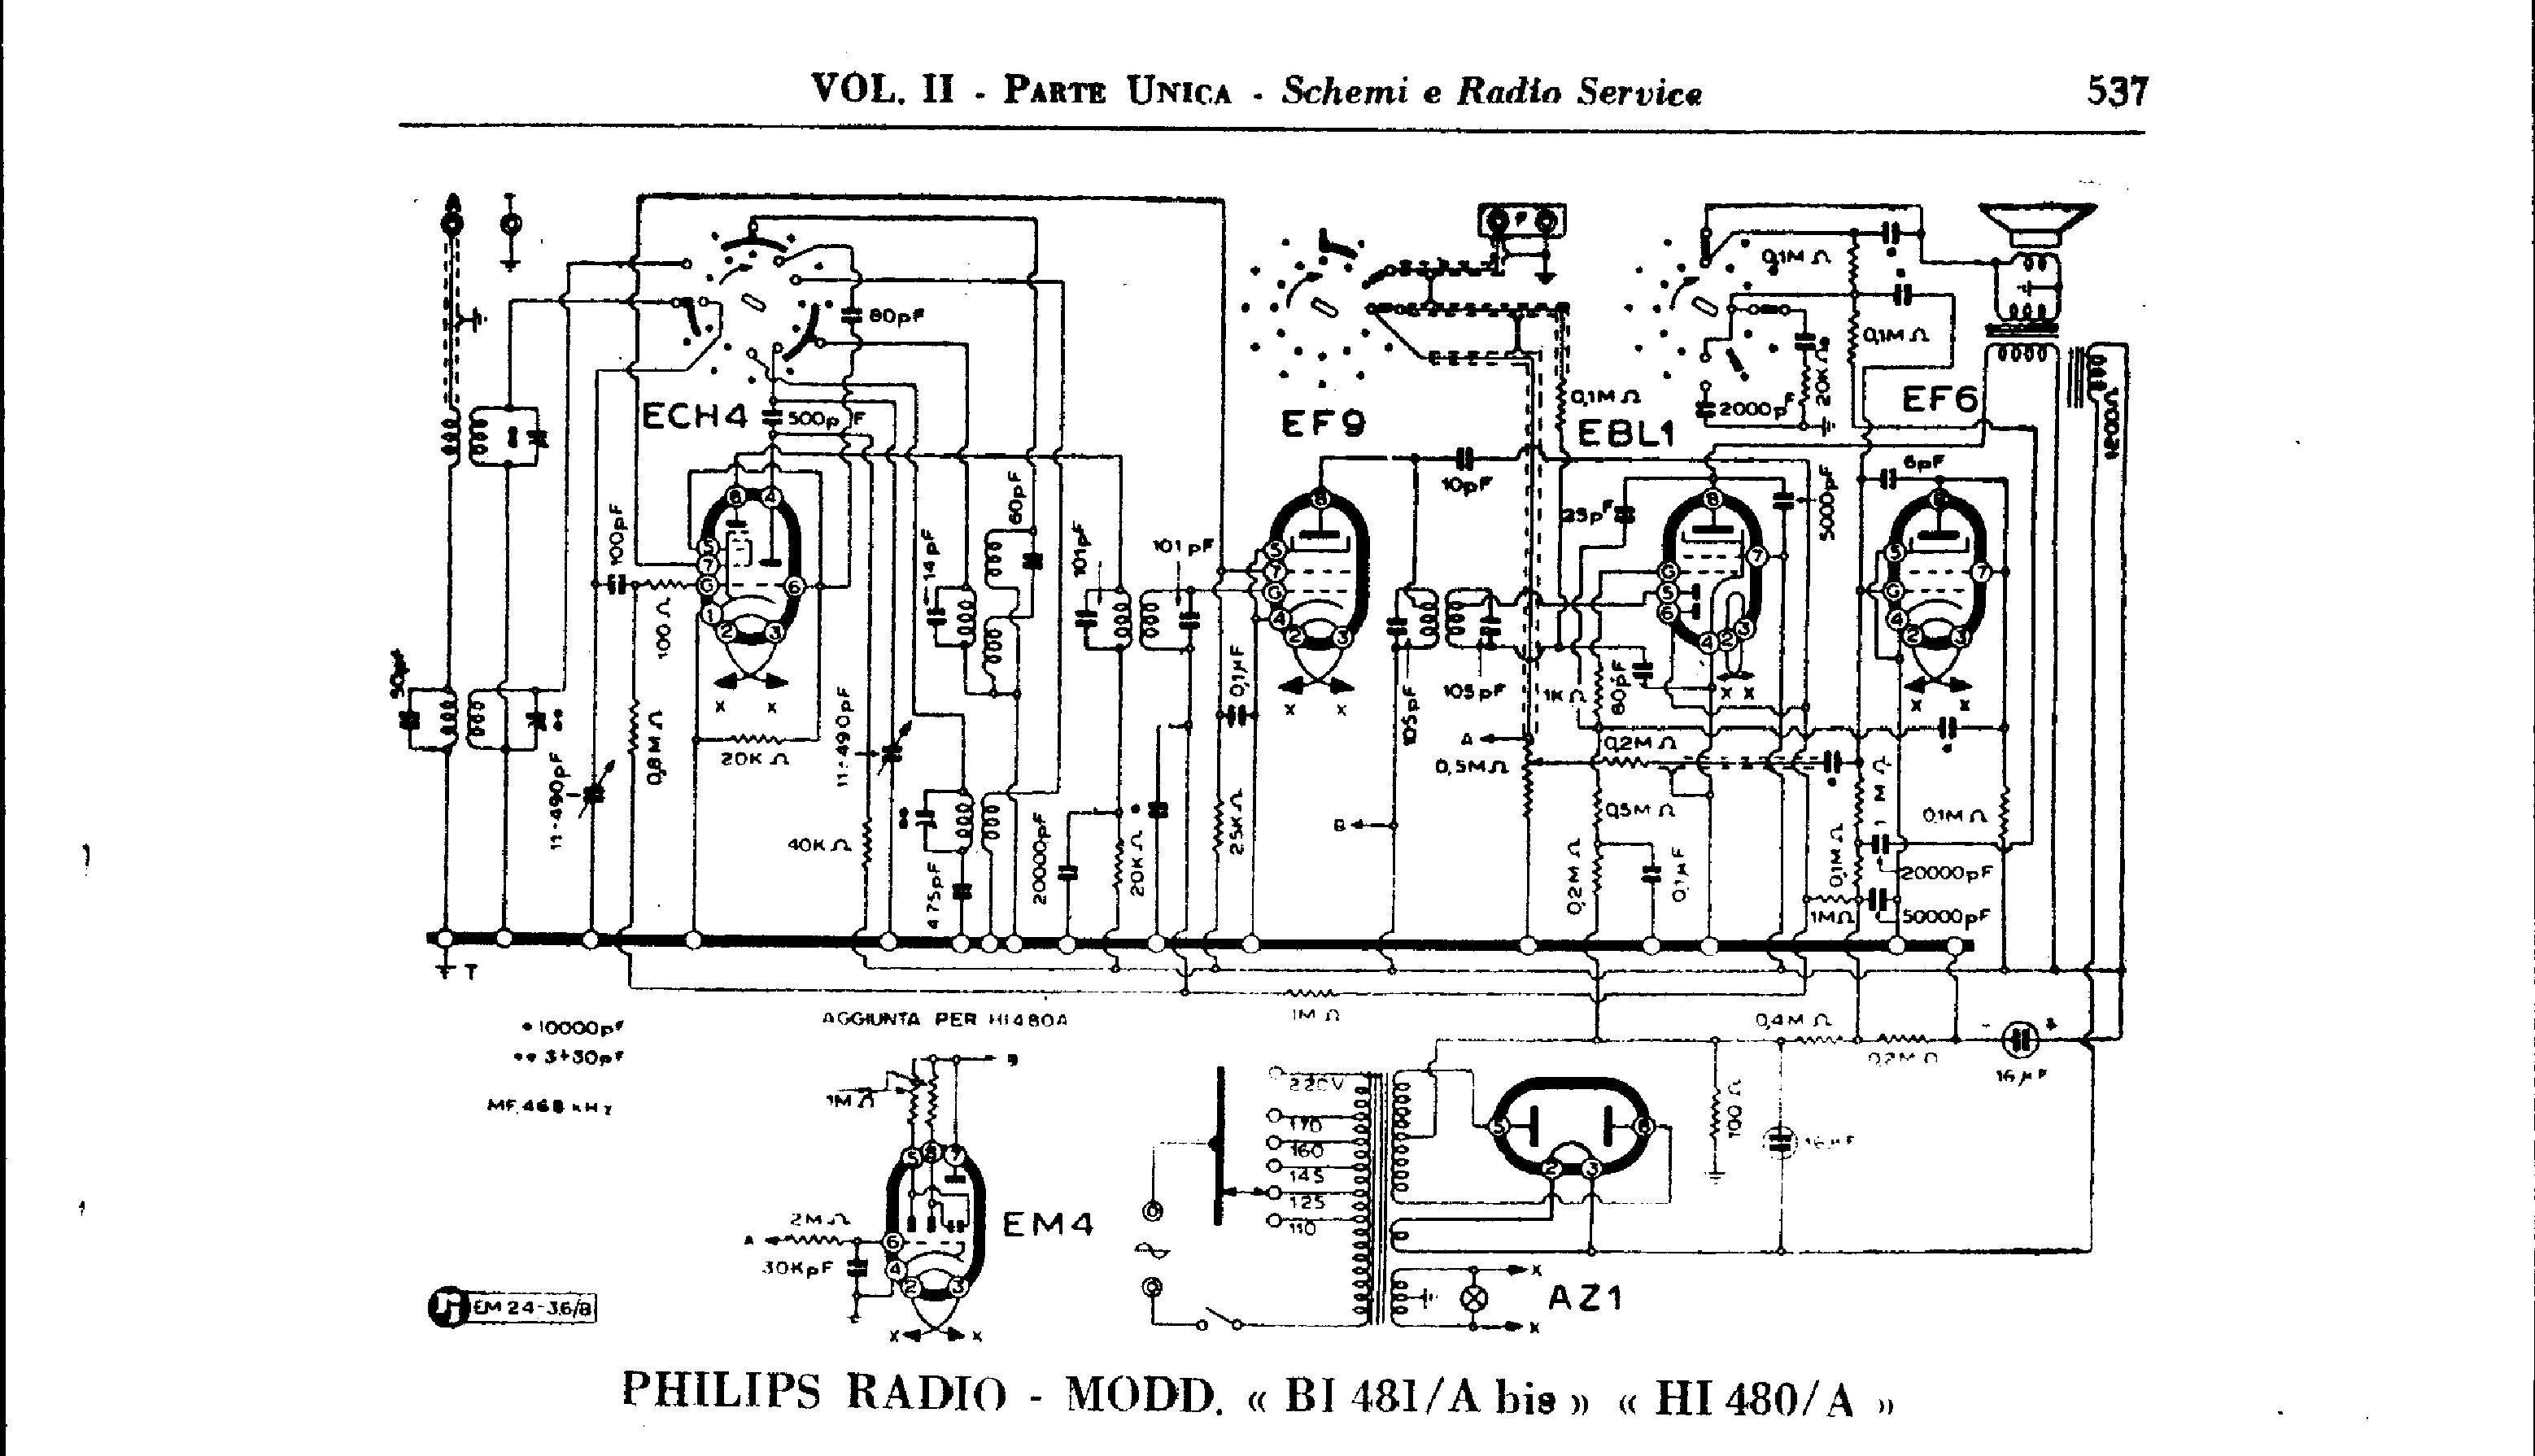 Philips Mfb 22rh541 Service Manual Free Download